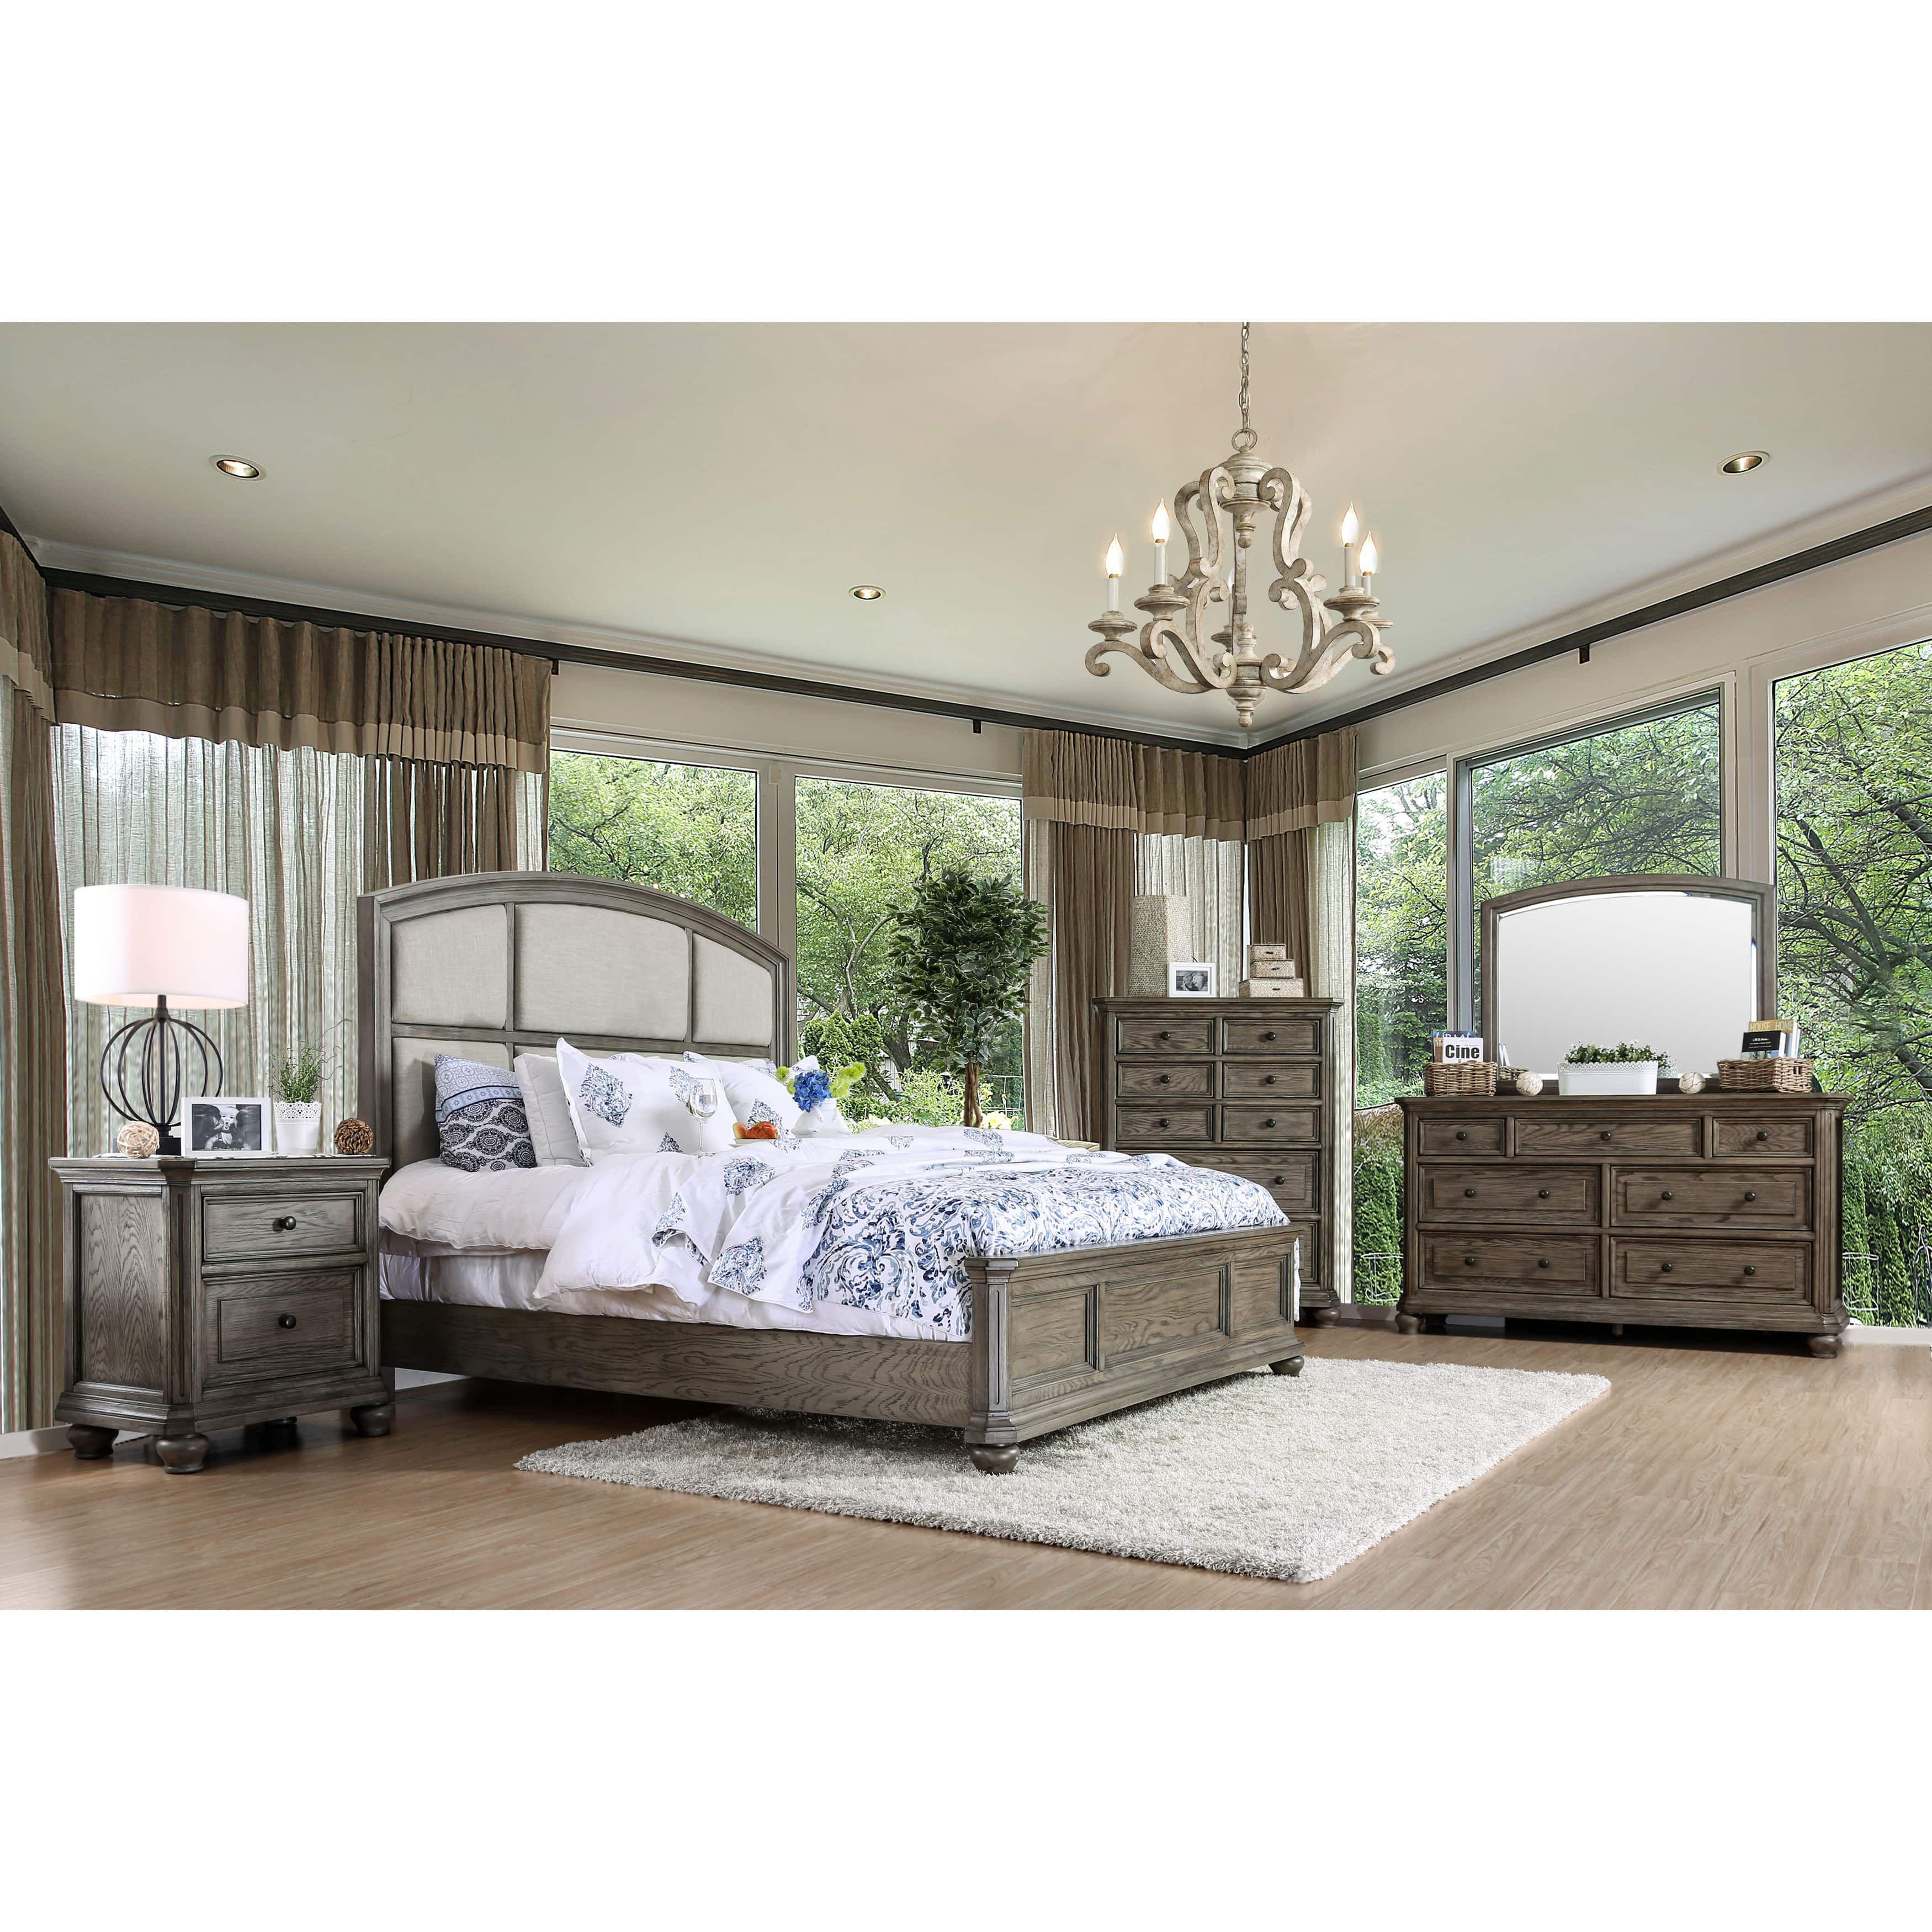 Furniture of america fenemi rustic piece wirebrushed grey bedroom